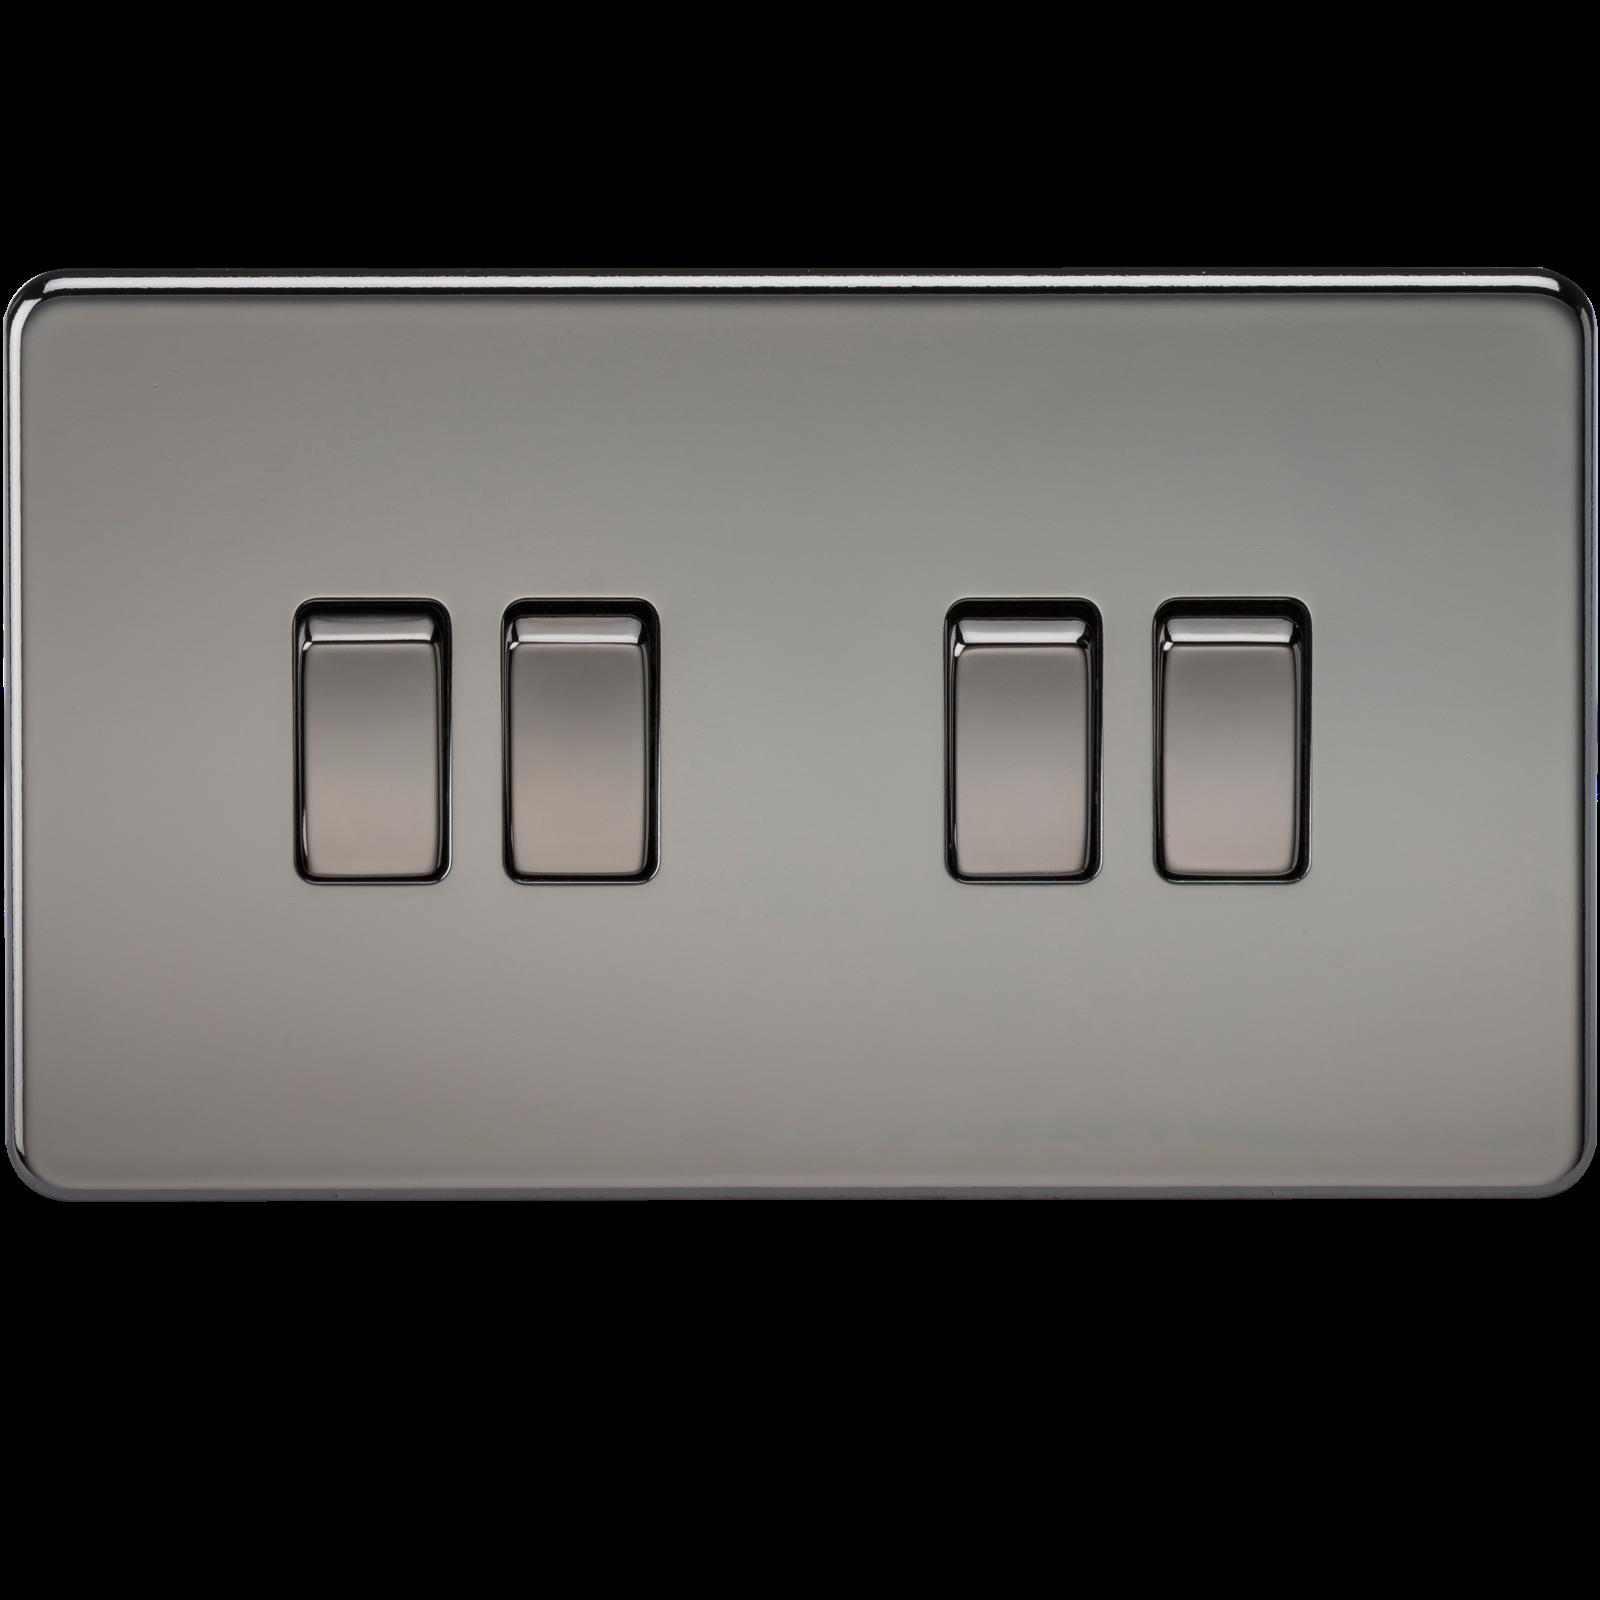 Screwless 10a 4g 2 Way Switch Black Nickel Wimbledon Lighting For Light